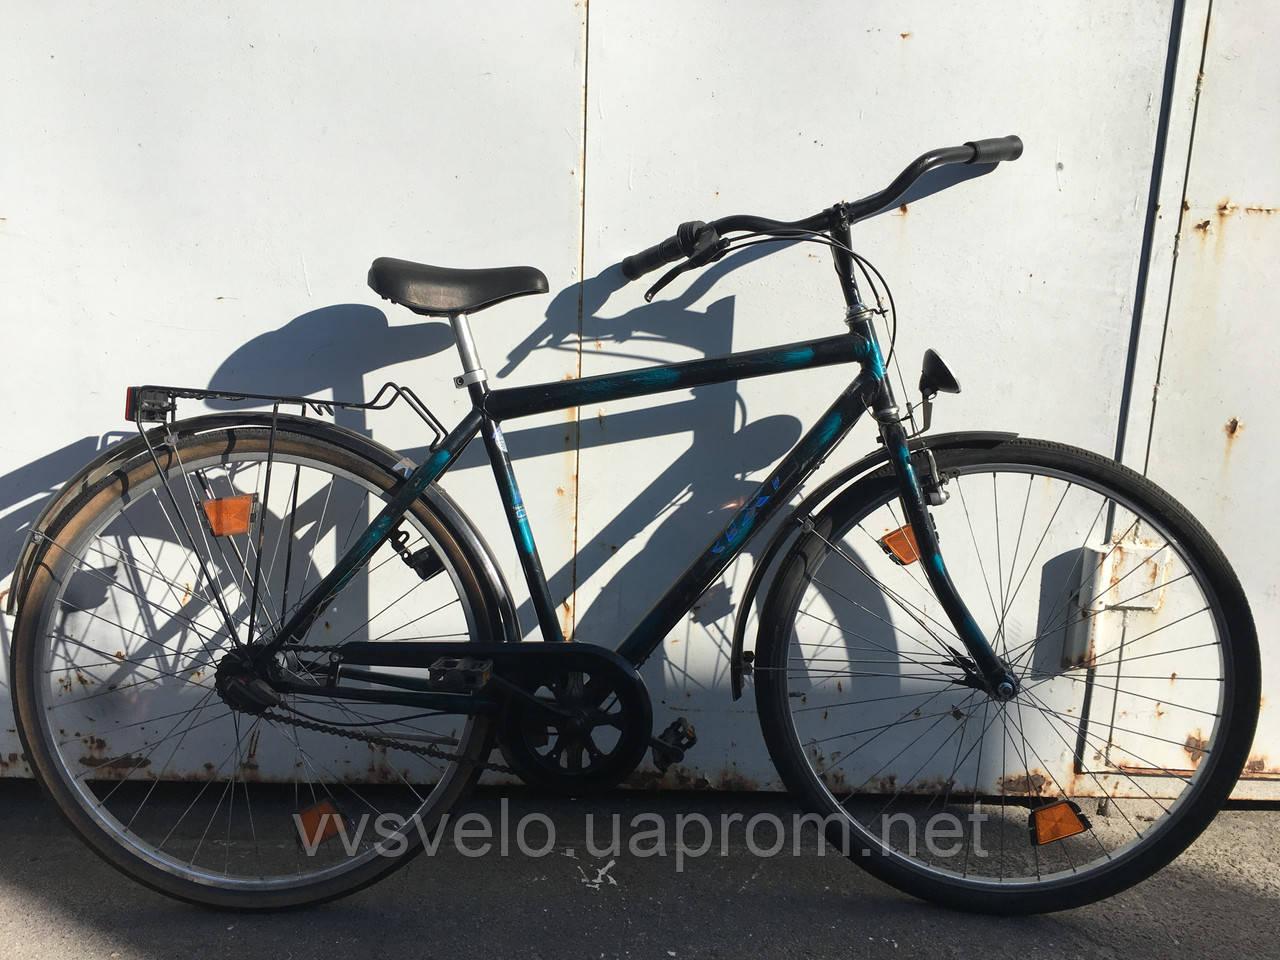 Велосипед на планетарной втулке SRAM s7 бу